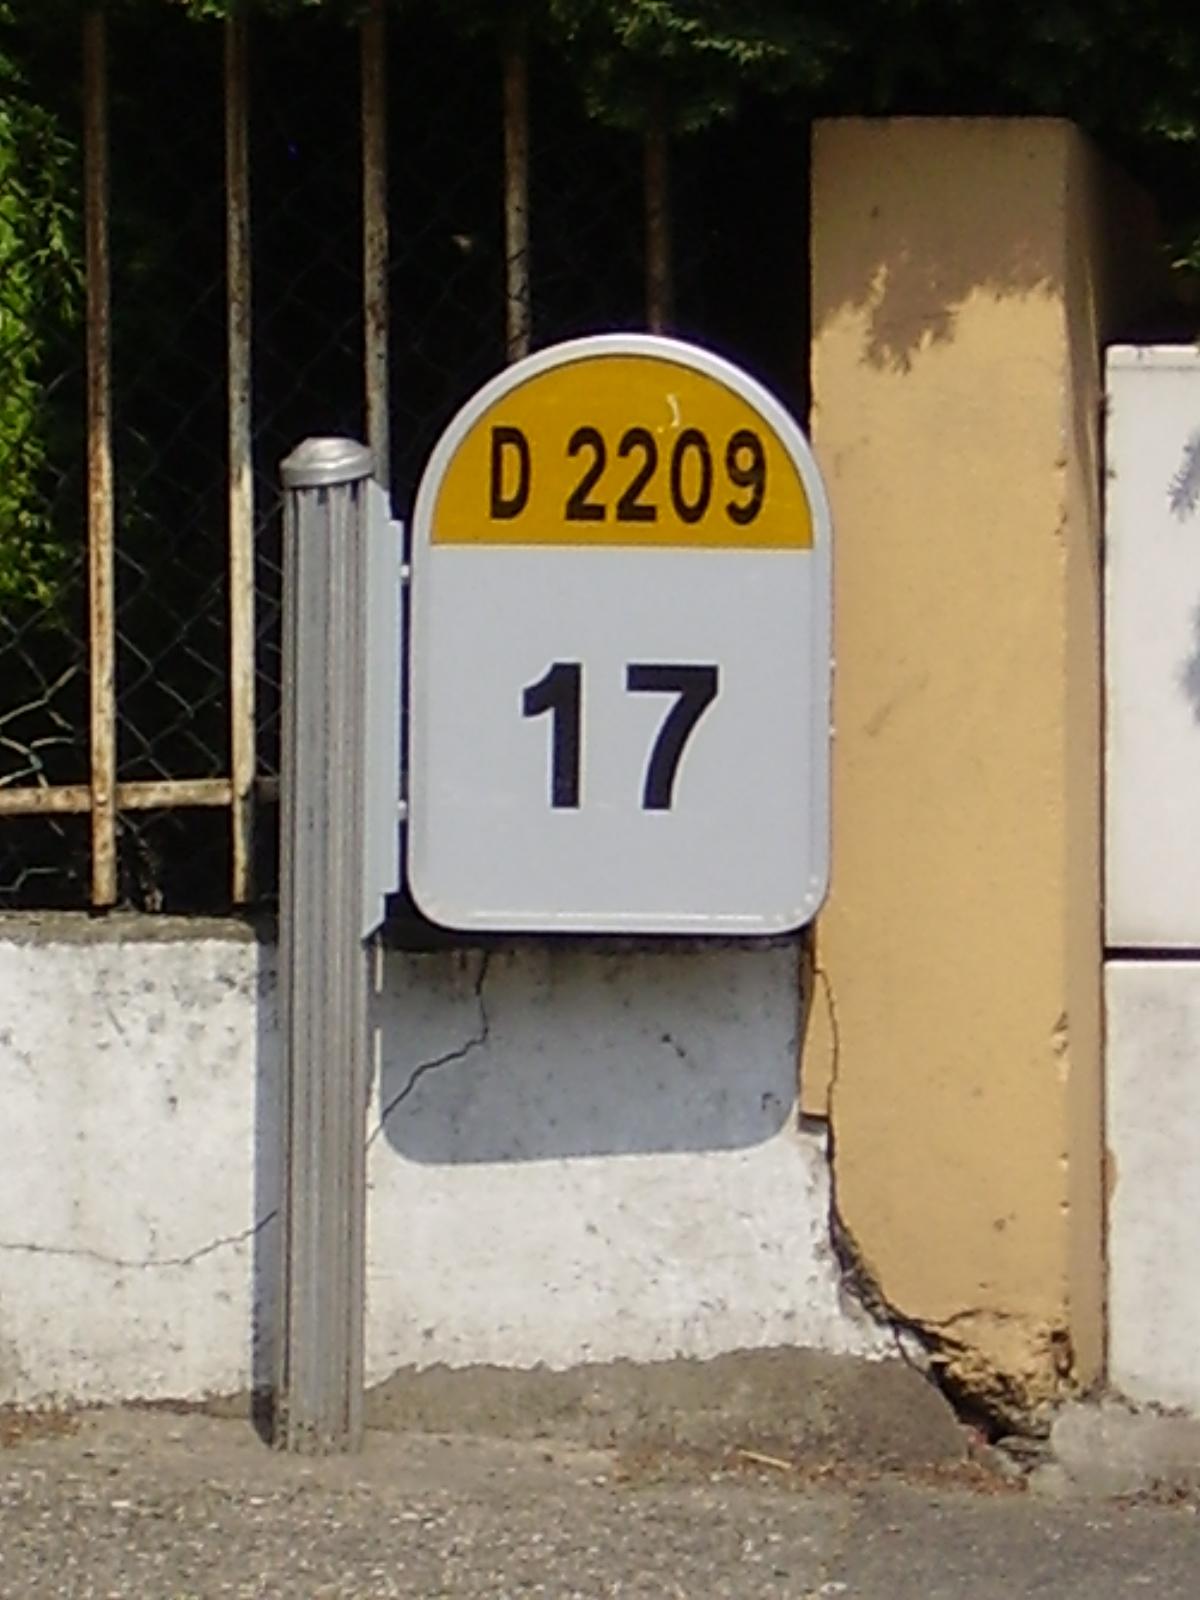 File:RD2209 03 kilomètre 17.JPG